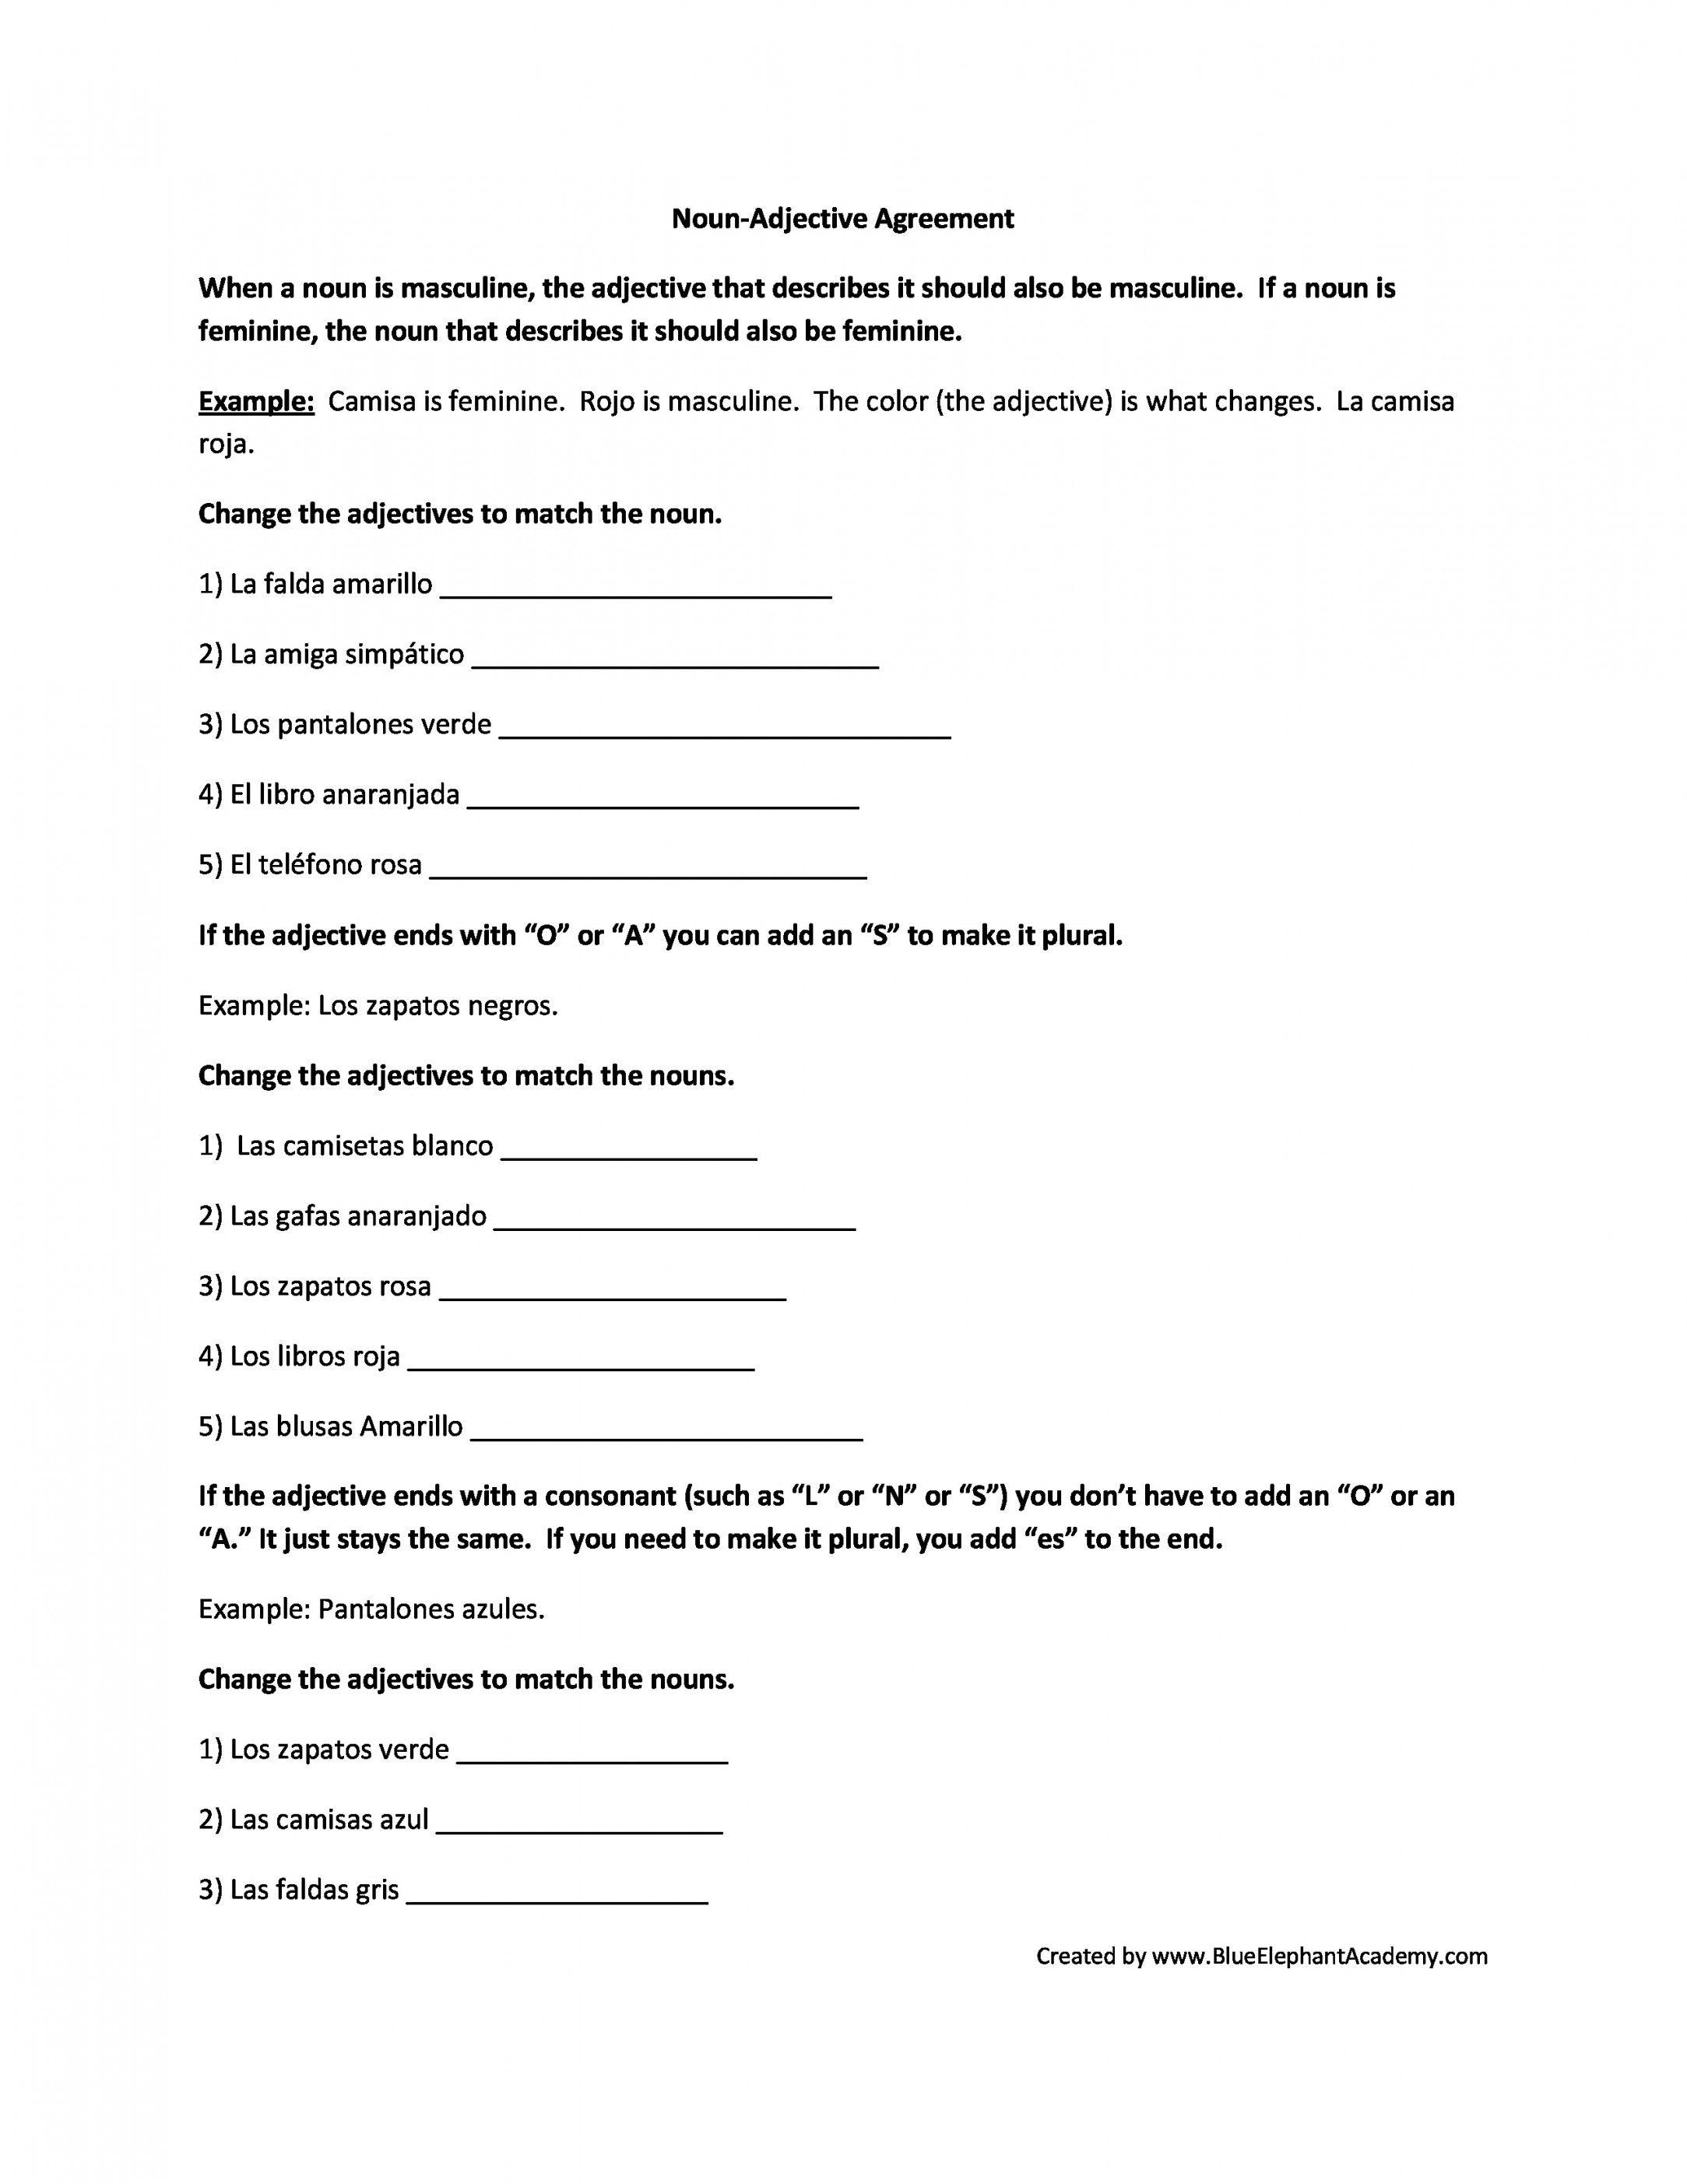 Free Printable Spanish Worksheets For Beginners | Lostranquillos - Free Printable Spanish Worksheets